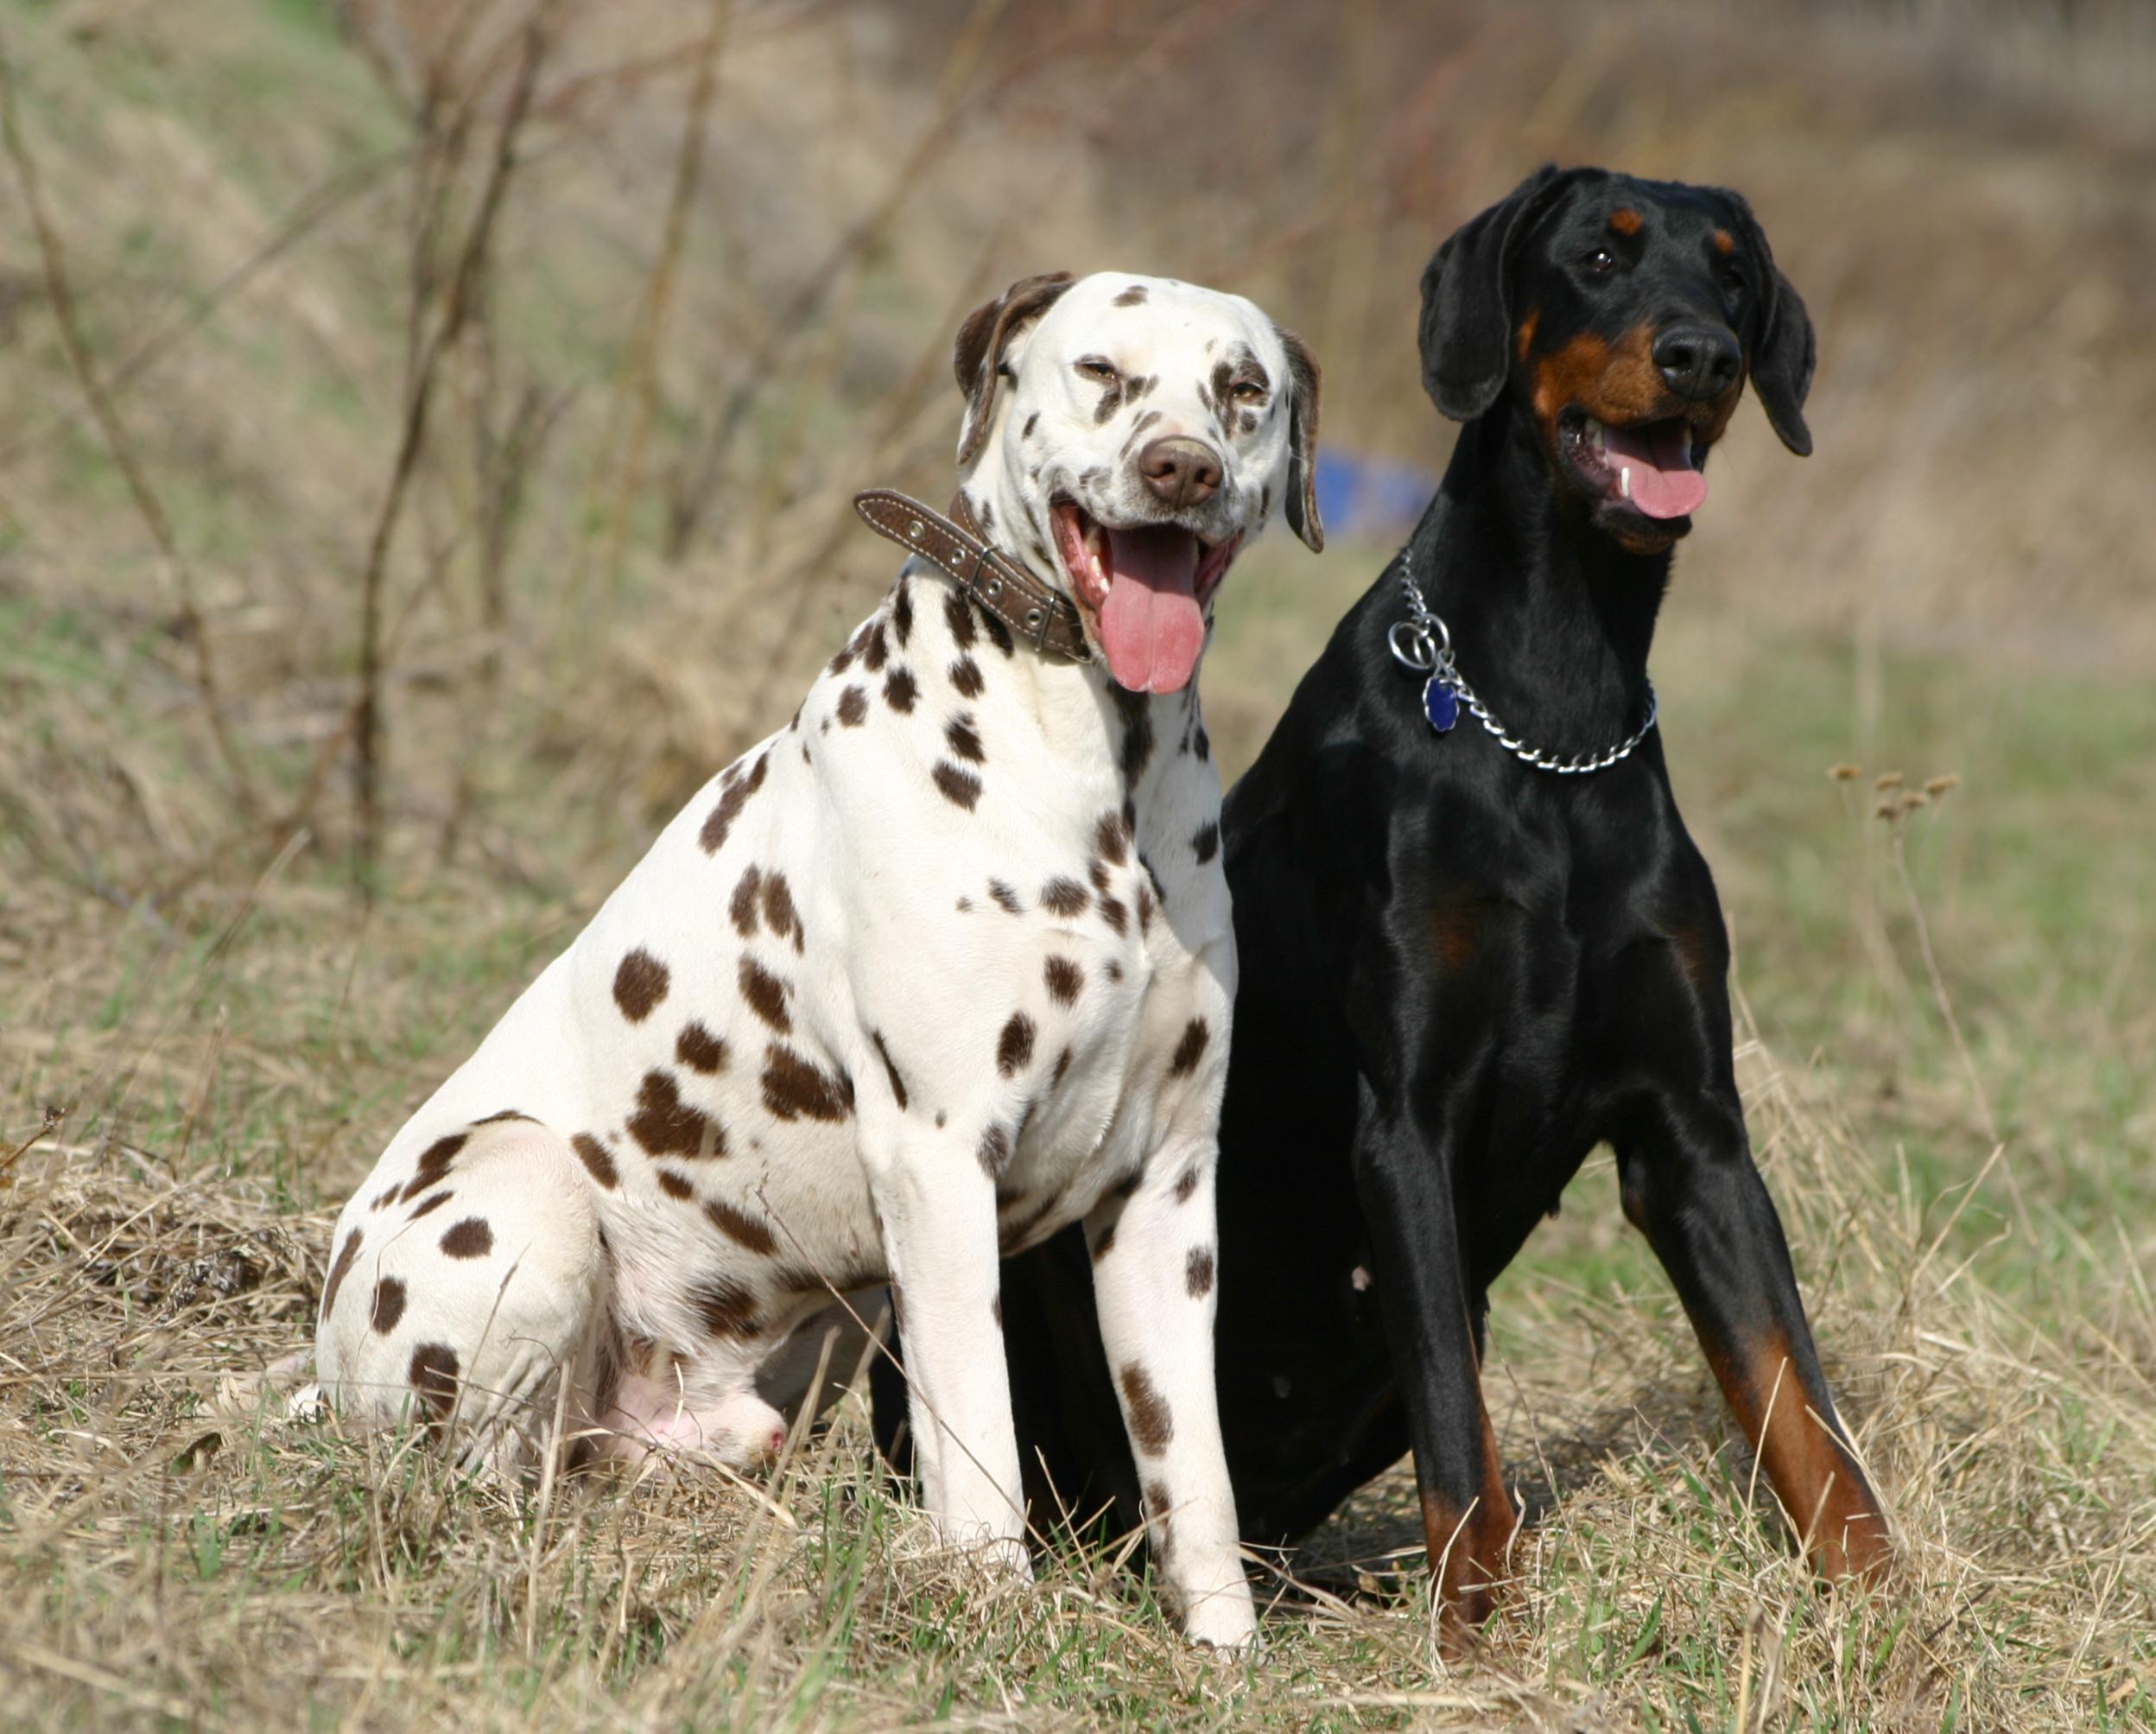 Should My Dog Eat Puppy Food Or Ground Turkey